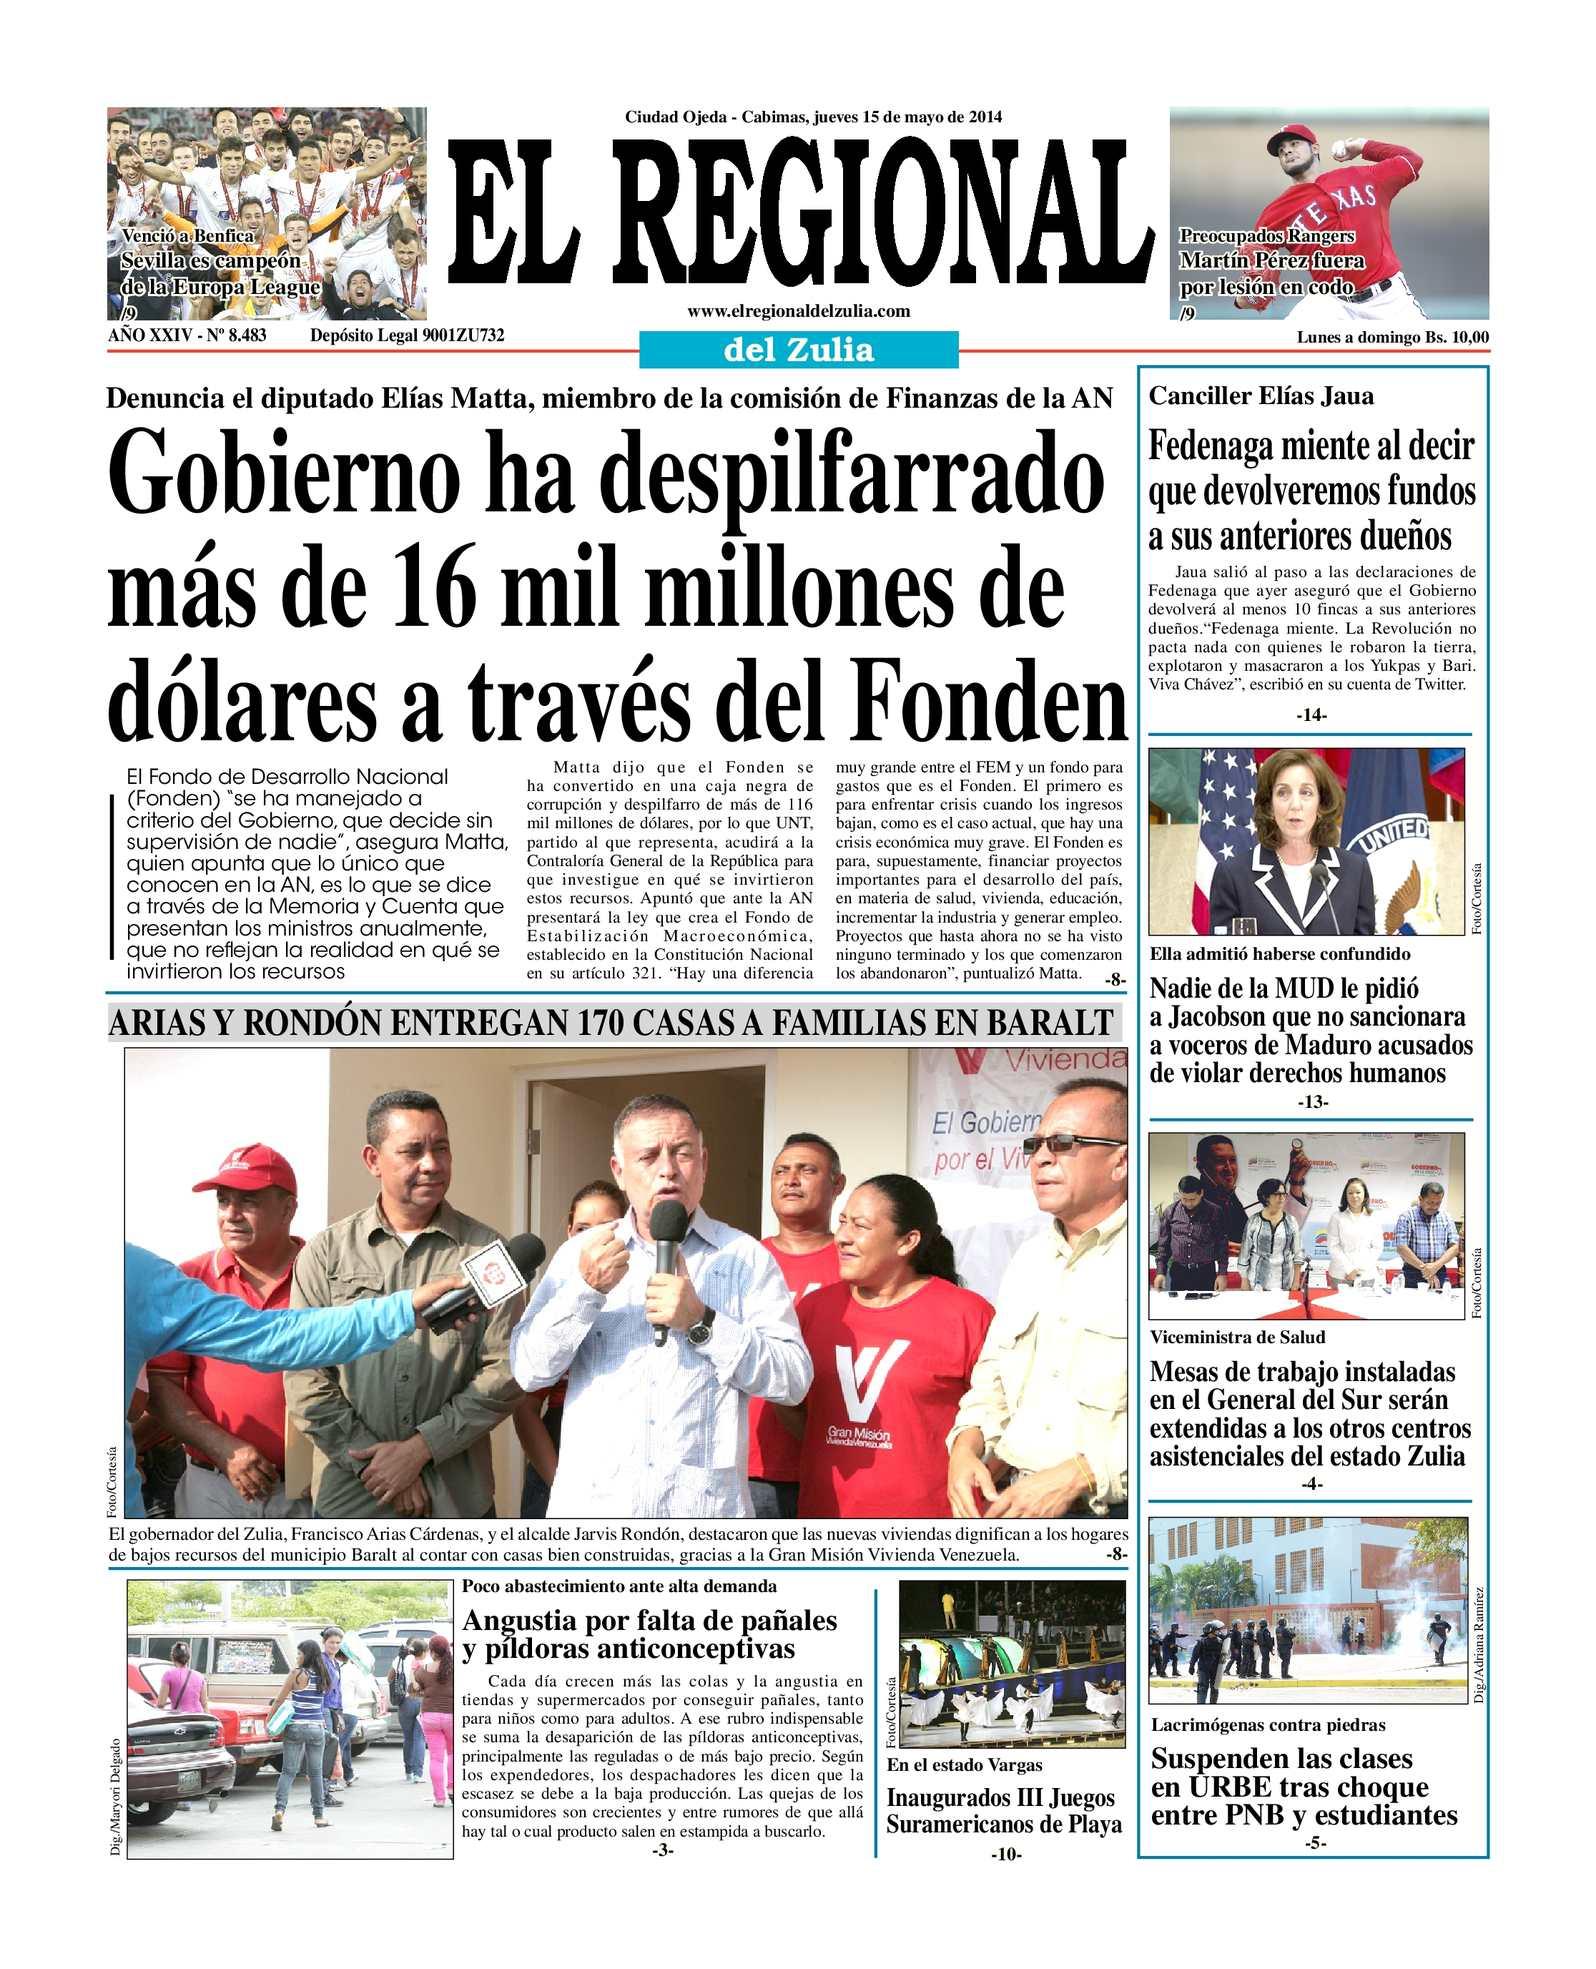 Calaméo - El Regional del Zulia 15-05-2014